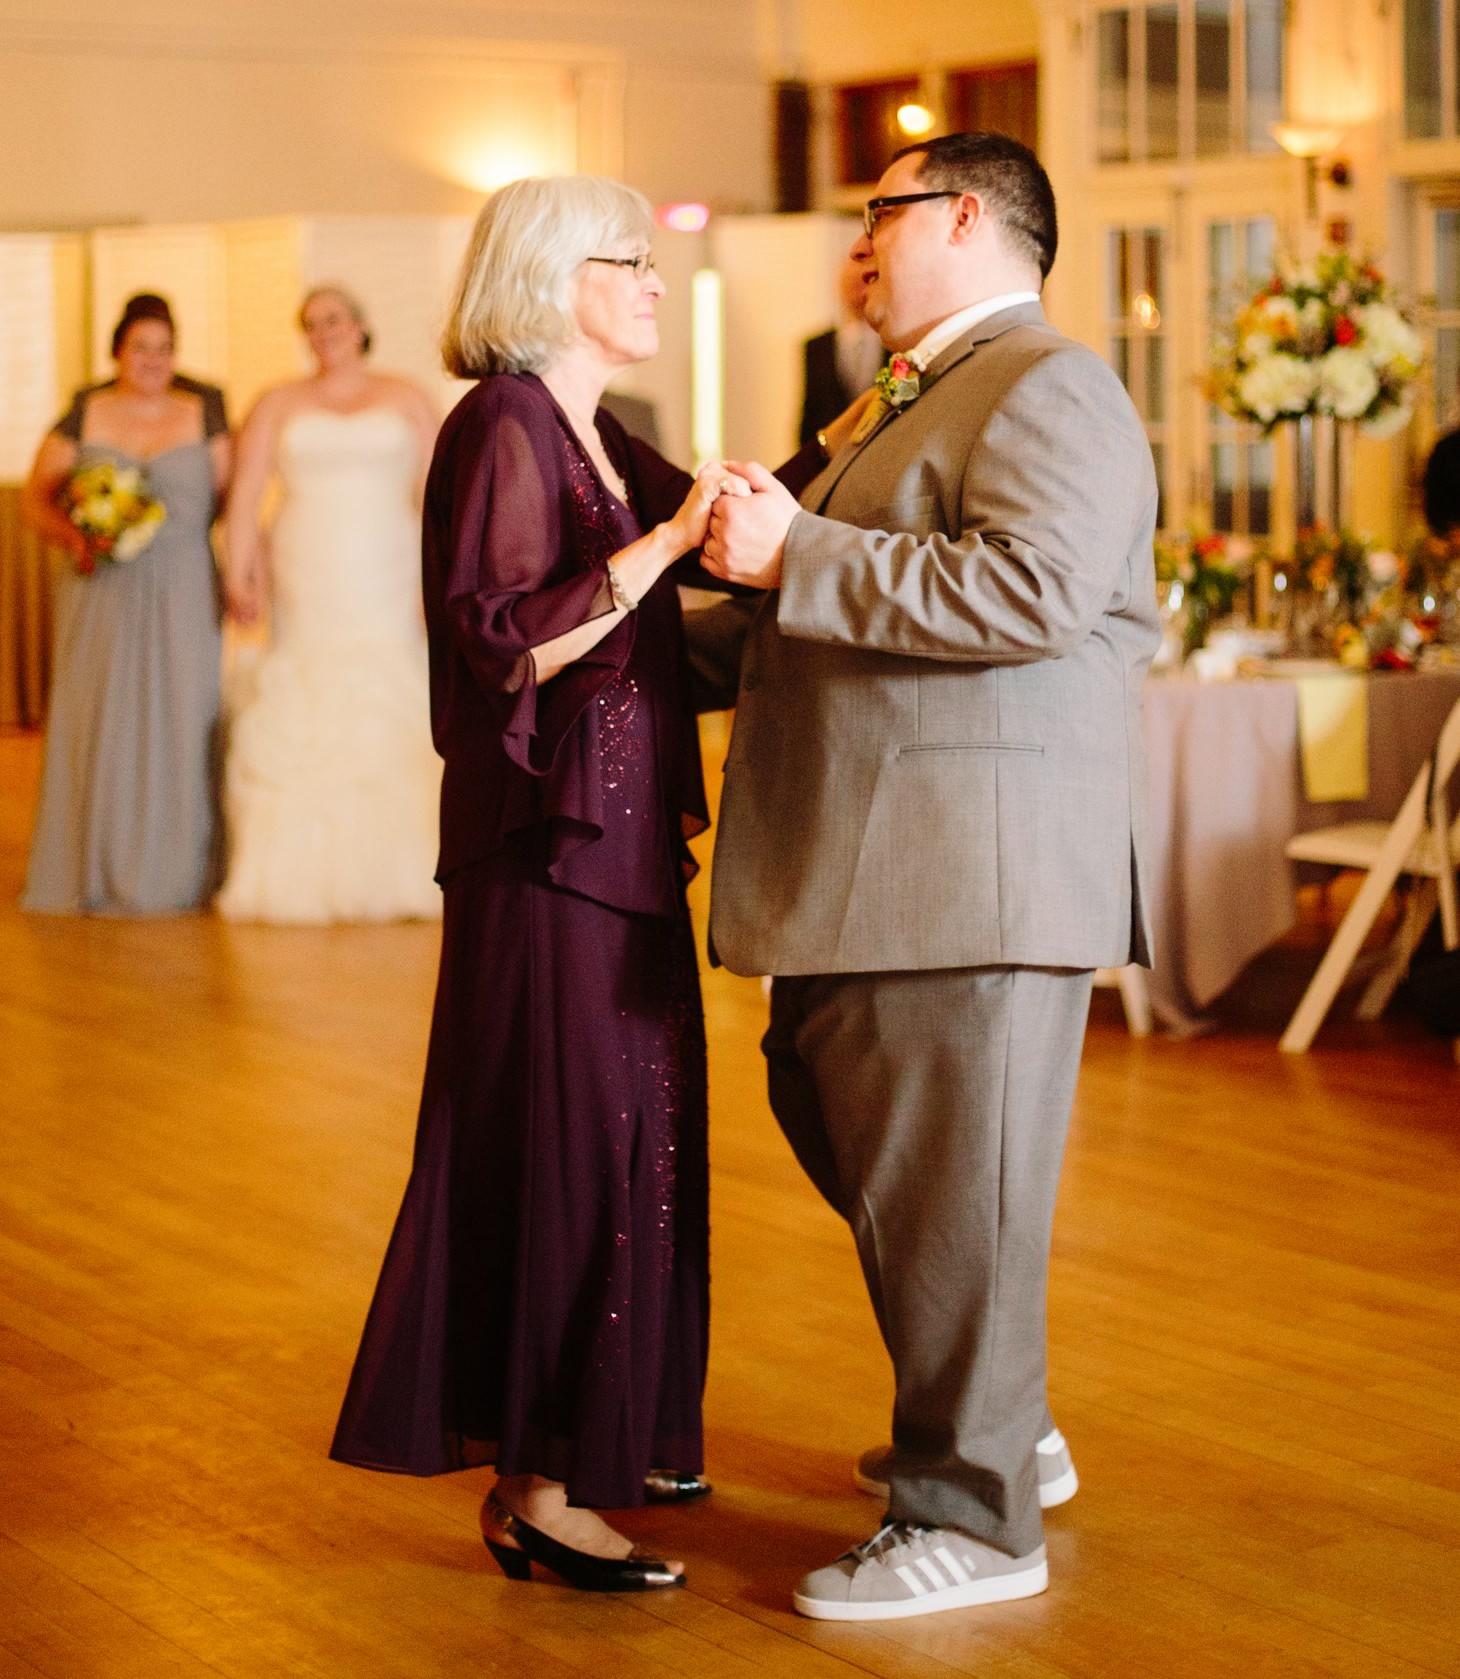 nyc-brooklyn-prospect-park-picnic-house-wedding-smitten-chickens-nerdy-49.jpg